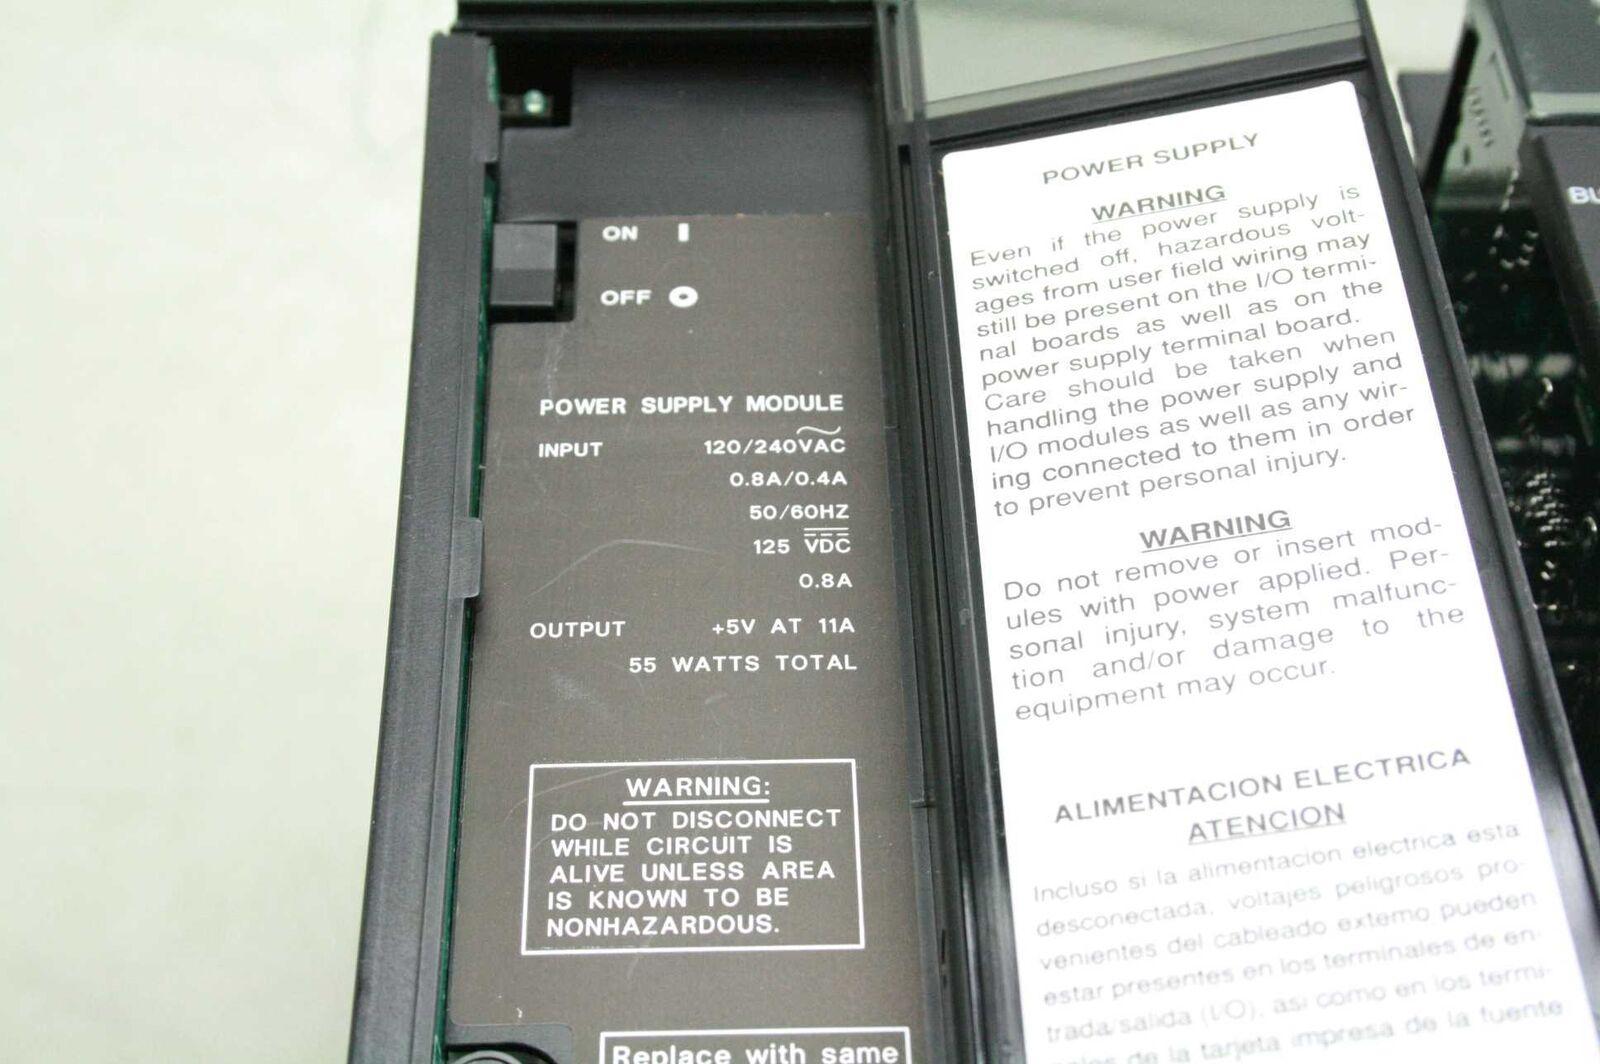 Ge Fanuc Séries 90-70 IC697PWR710F IC697PWR710F IC697PWR710F Alimentation Électrique W/4 I/O Modules c7177b